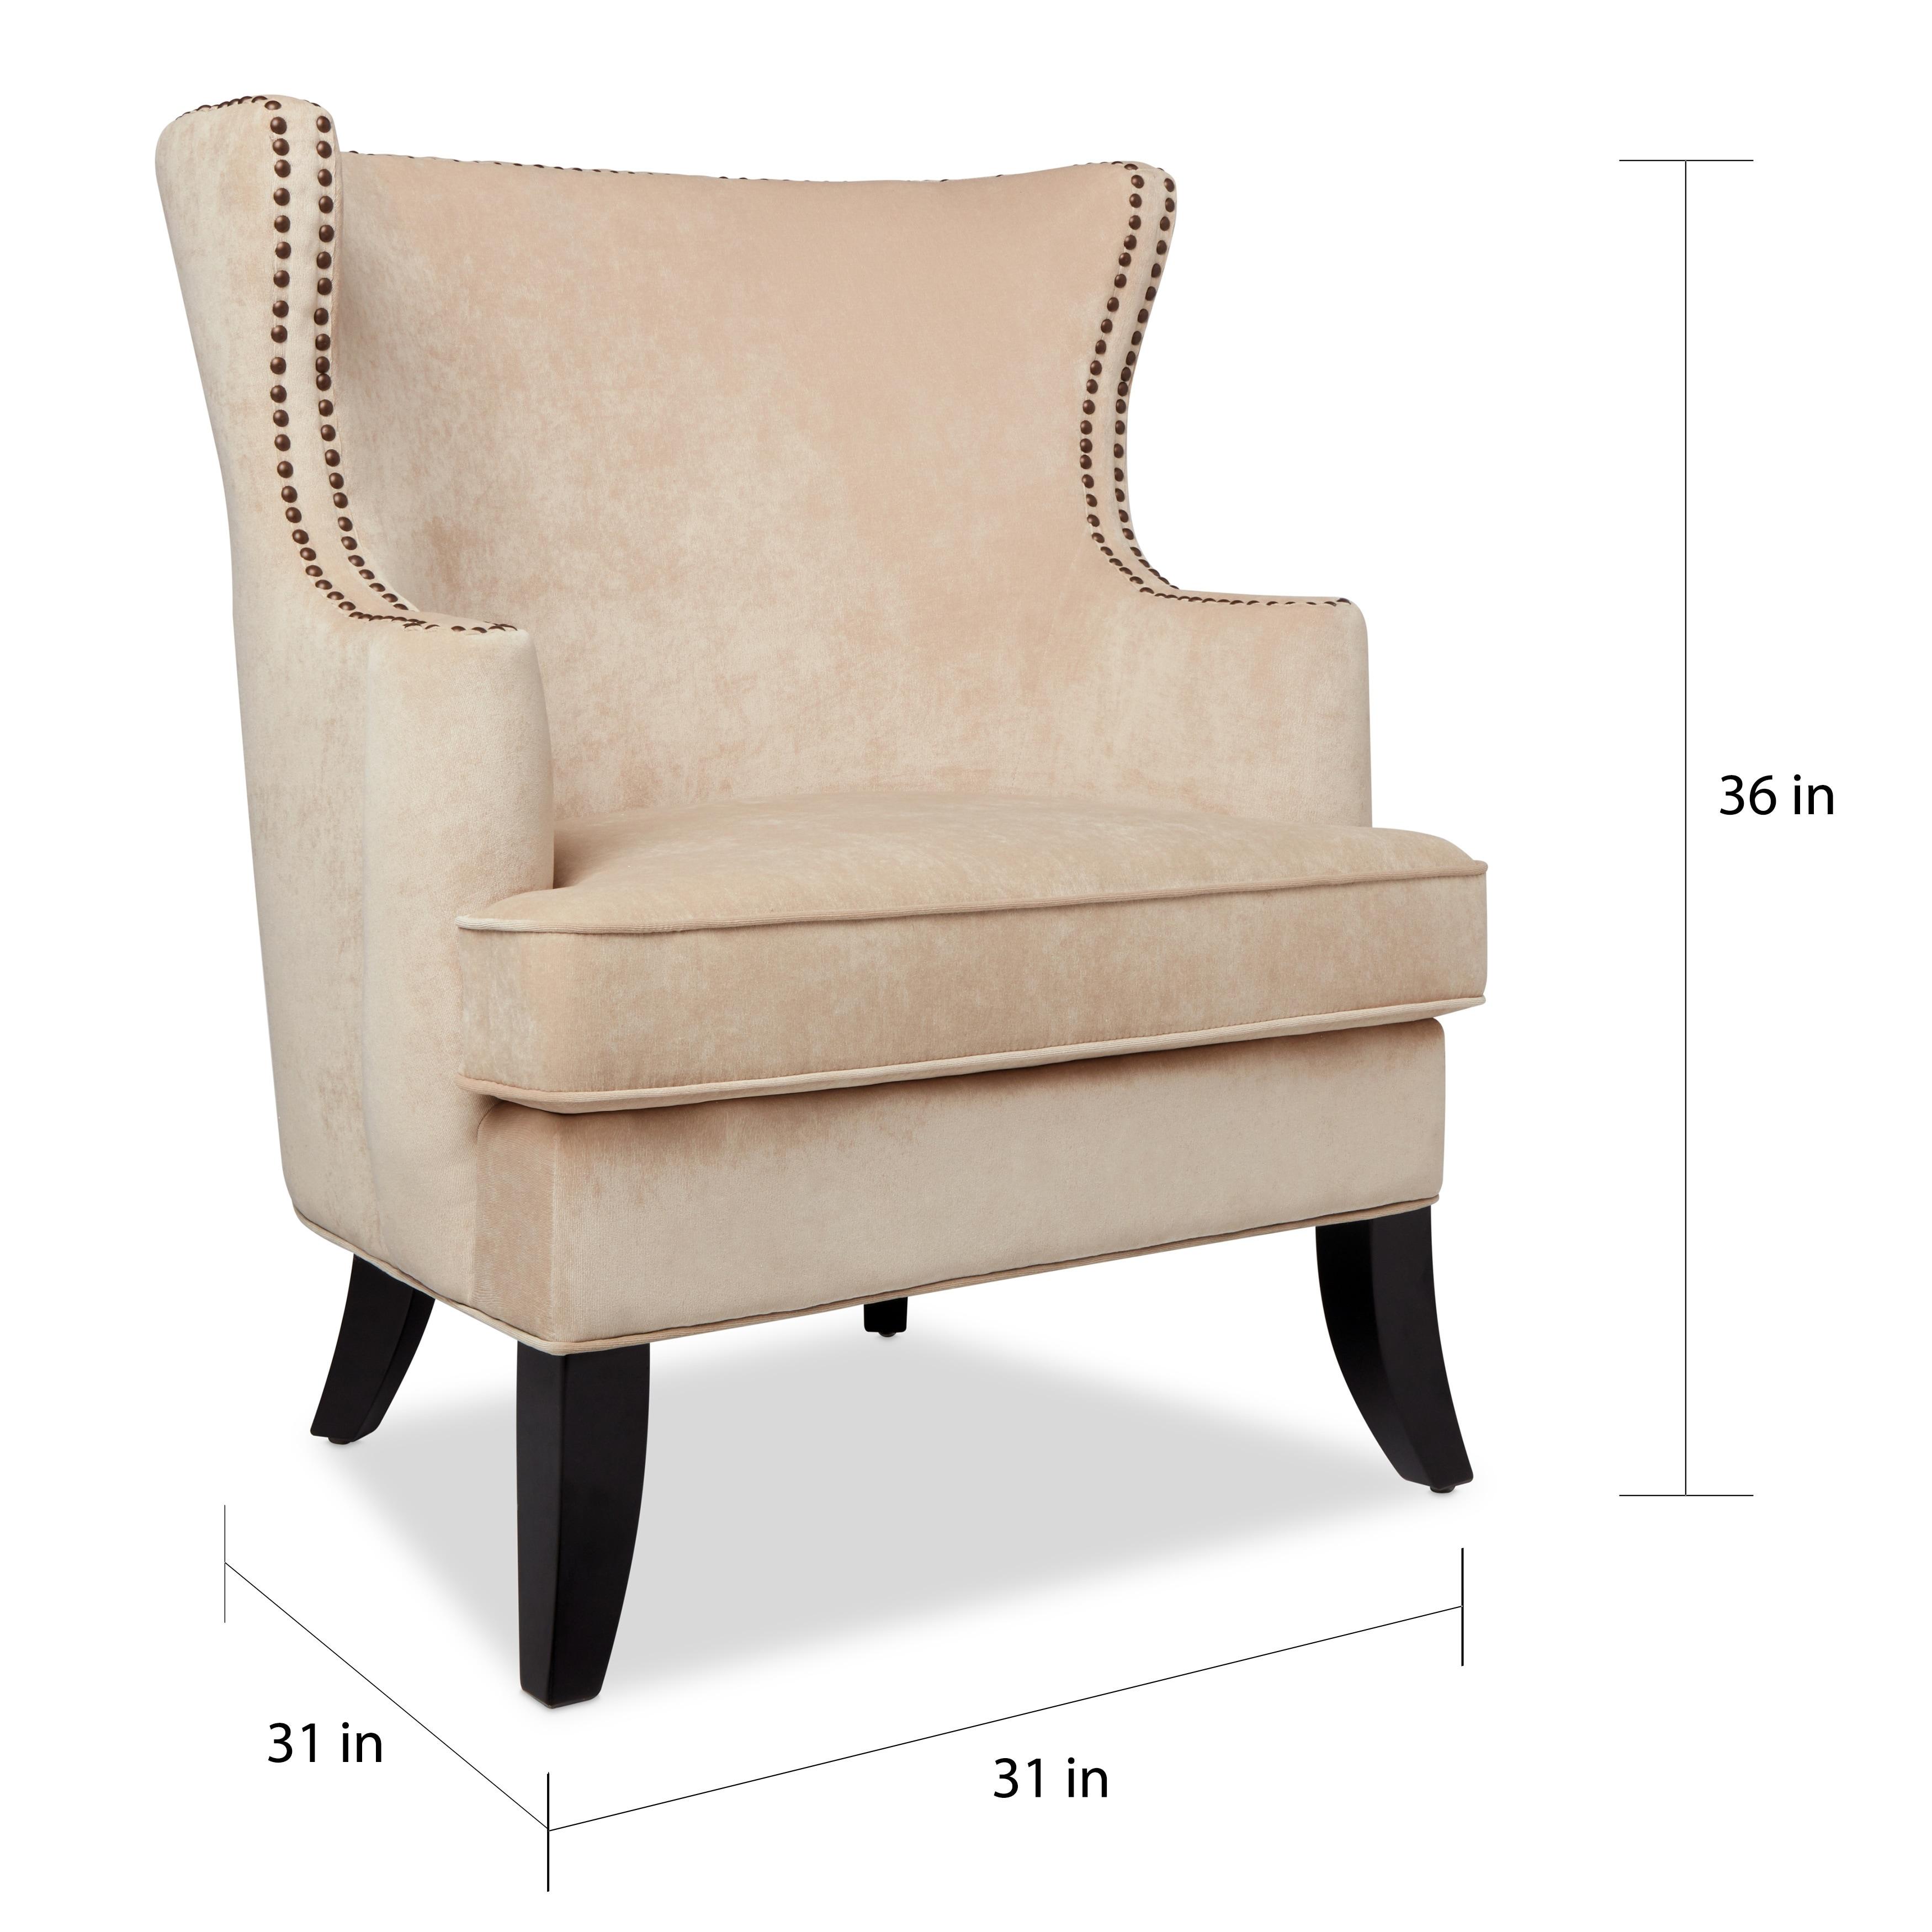 Charmant Shop Abbyson Lauren Beige Velvet Nailhead Armchair   On Sale   Free  Shipping Today   Overstock.com   10518452